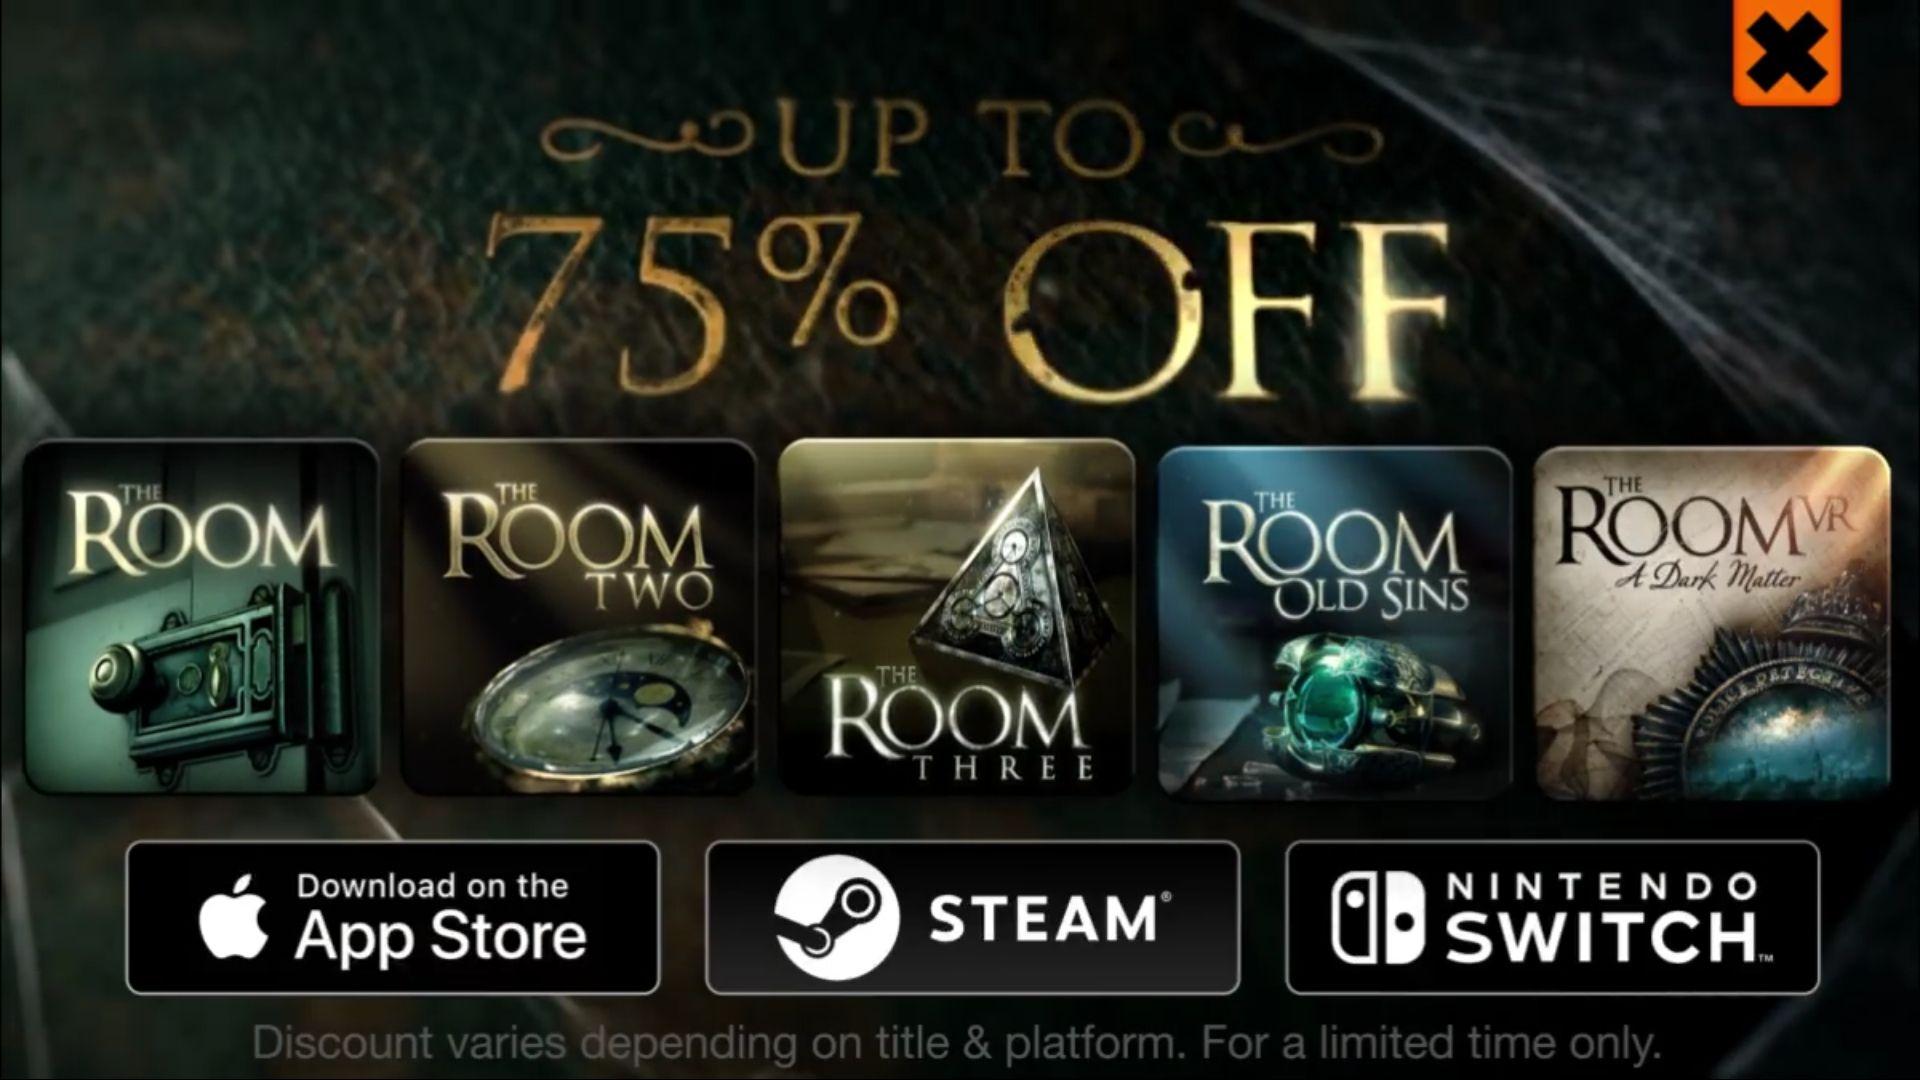 Seria The Room nawet do 75% taniej na Android, App Store, Steam i Nintendo Switch